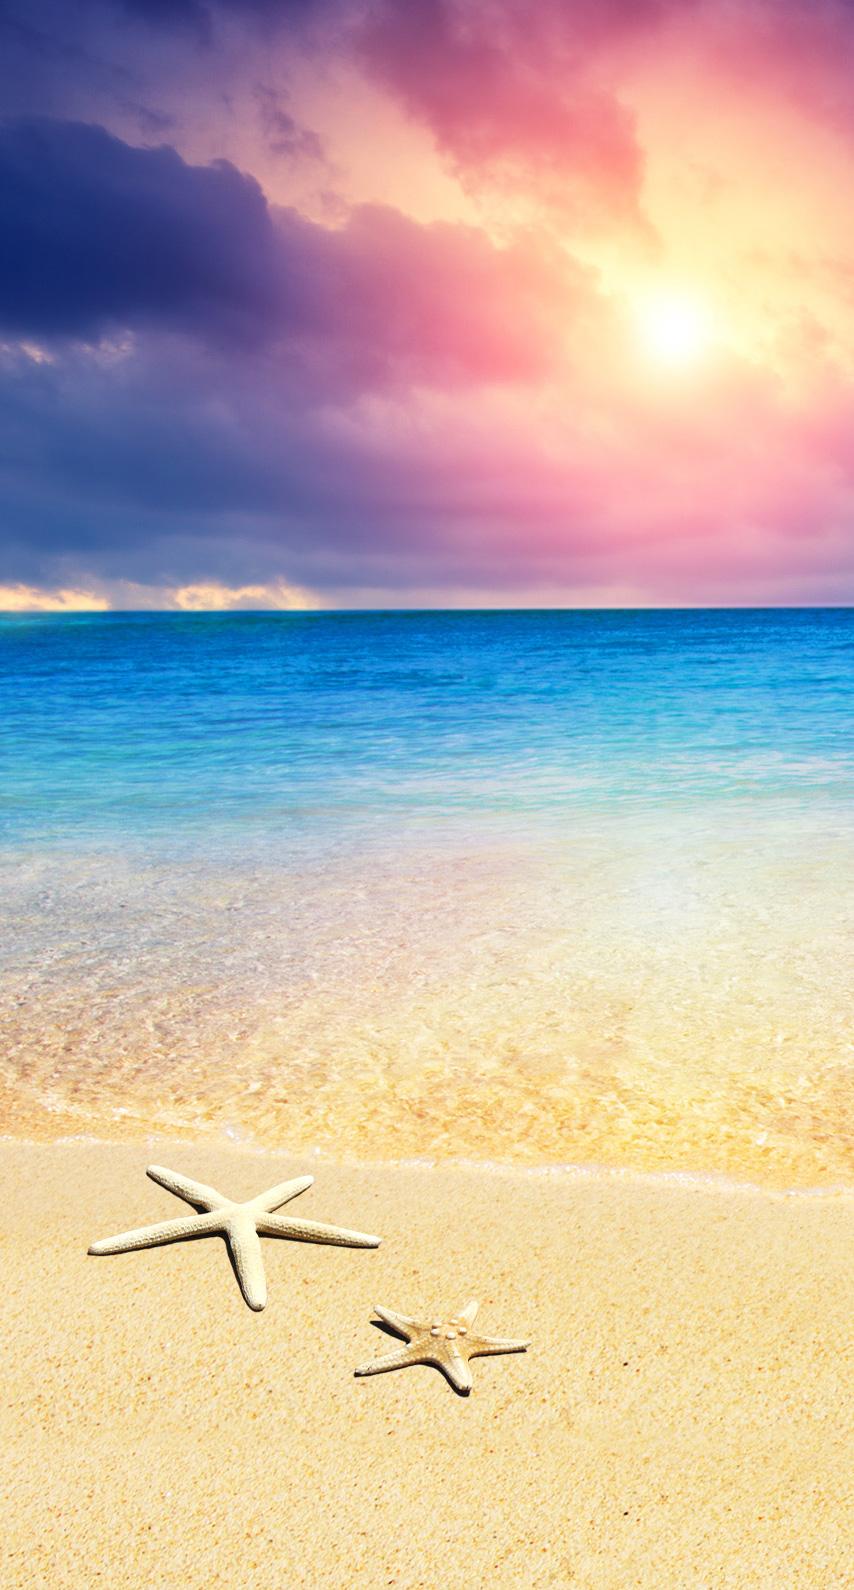 fair weather, surf, seascape, seashore